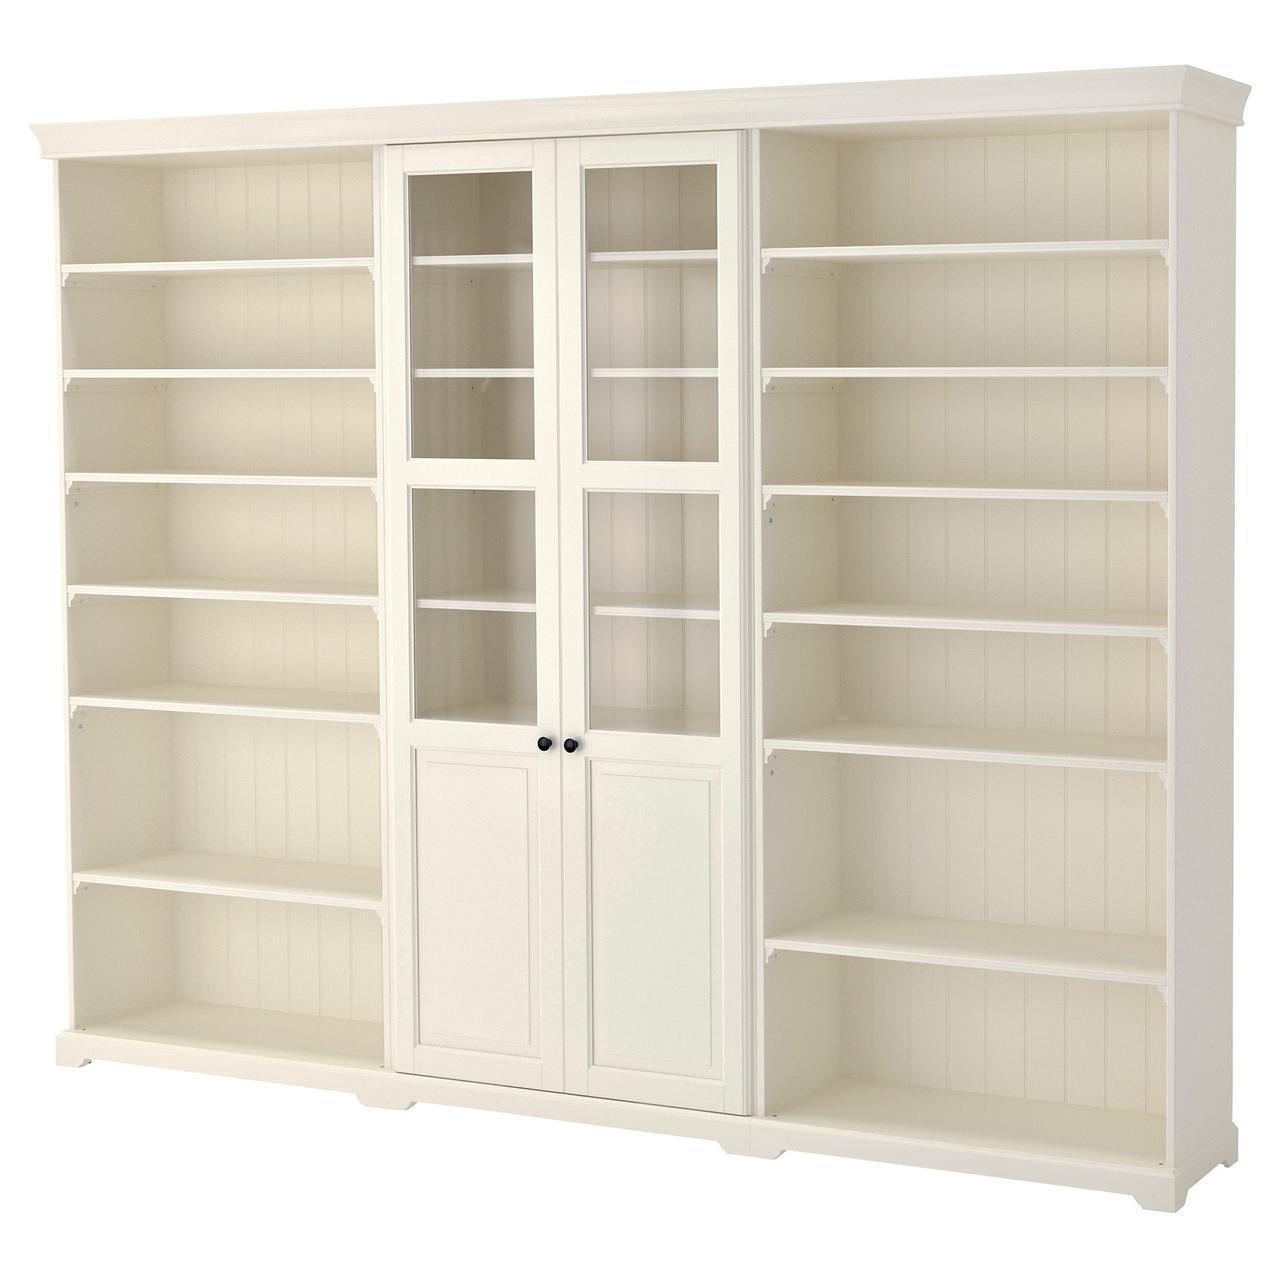 ✅ IKEA LIATORP (990.464.43) Шкаф, белый